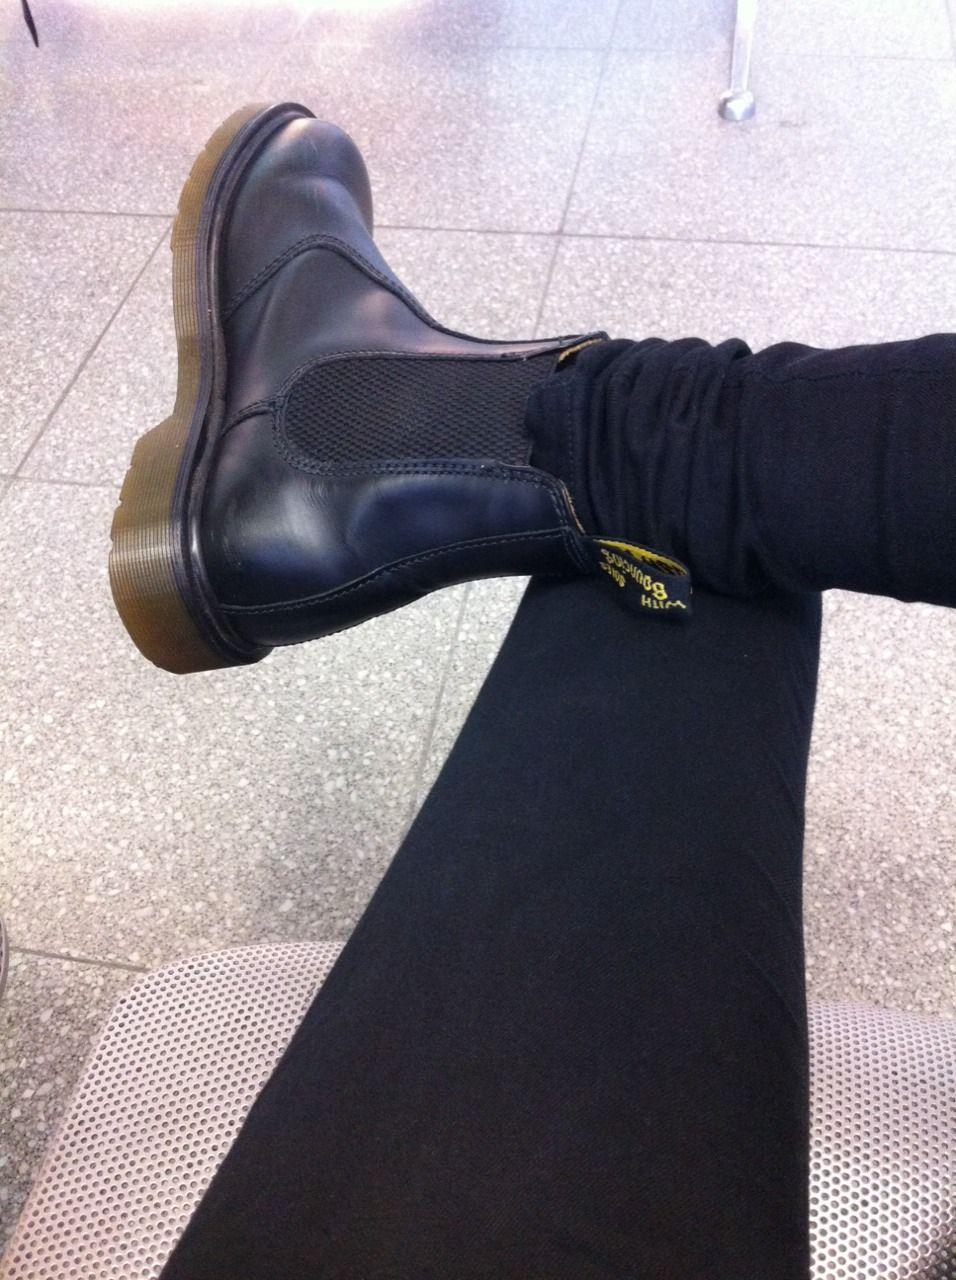 Dr Marten Chelsea Boots 2976 Chelsea Boots Outfit Dr Martens Chelsea Boot Chelsea Boots